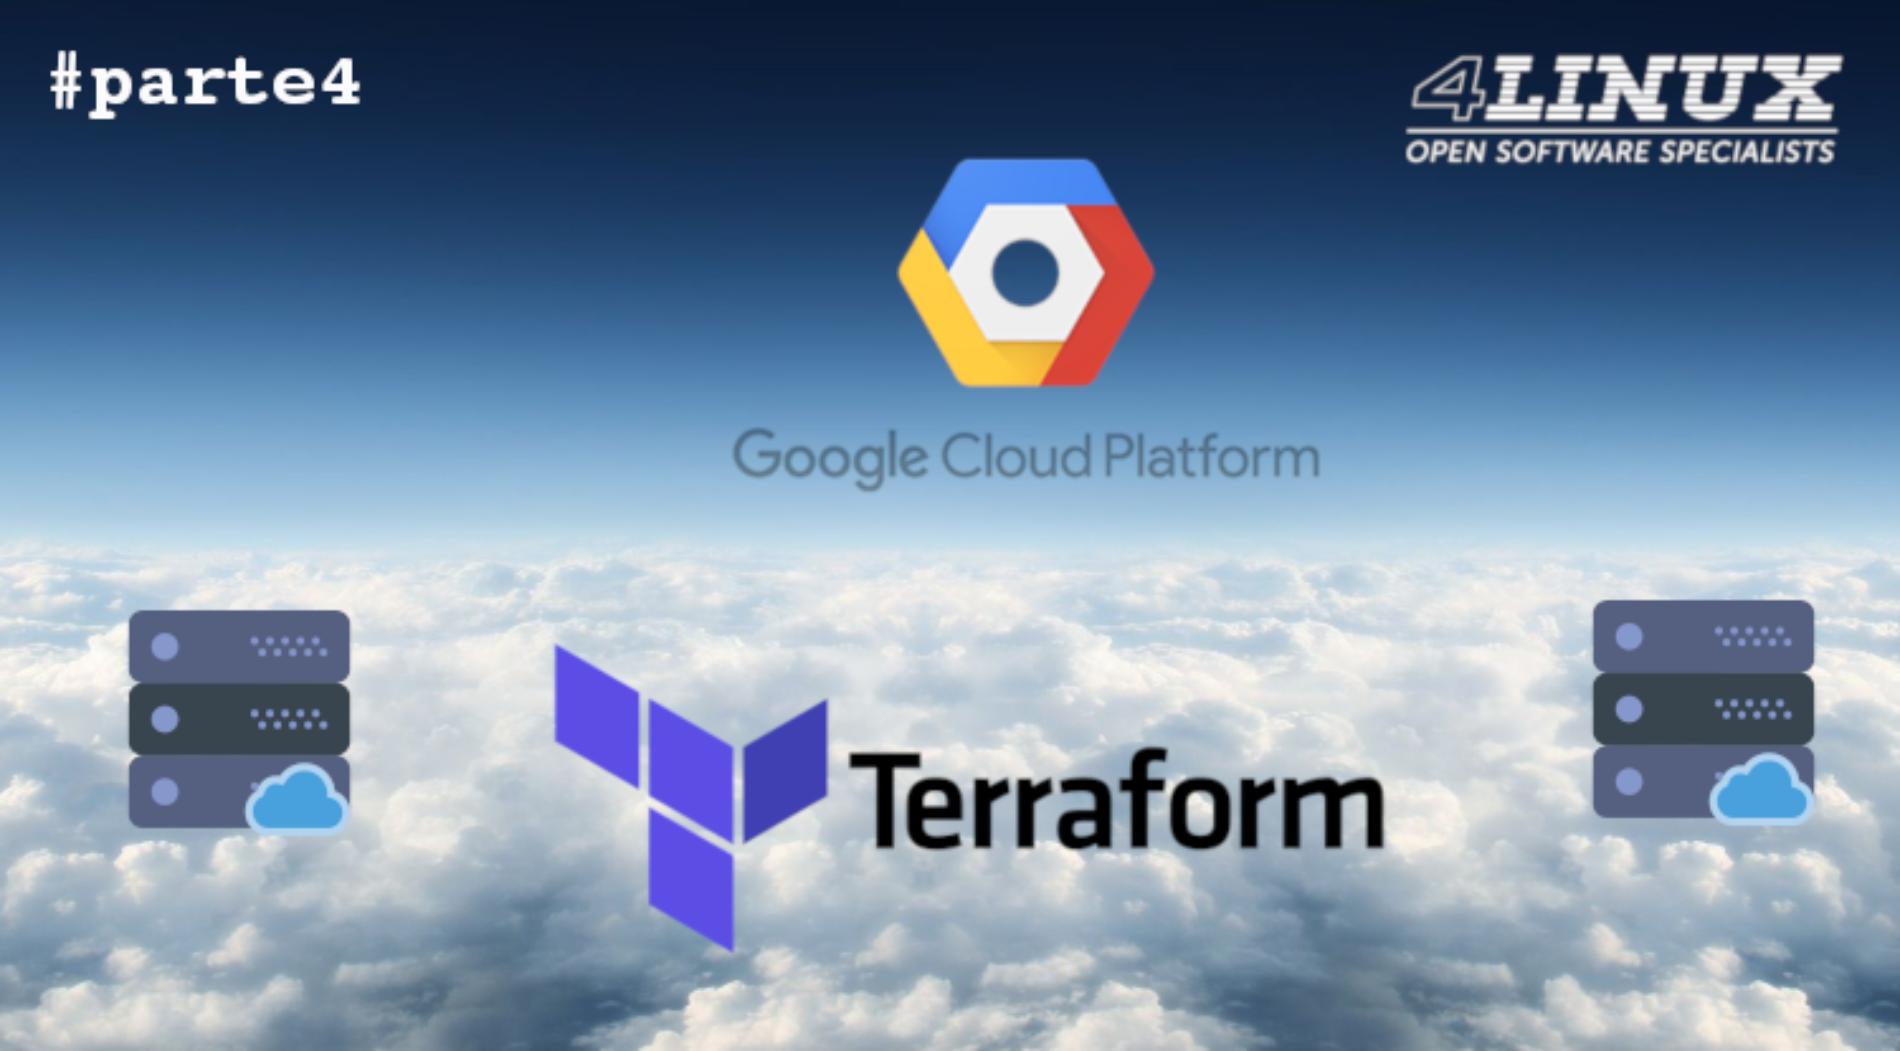 Terraform #parte4 – Criando módulos